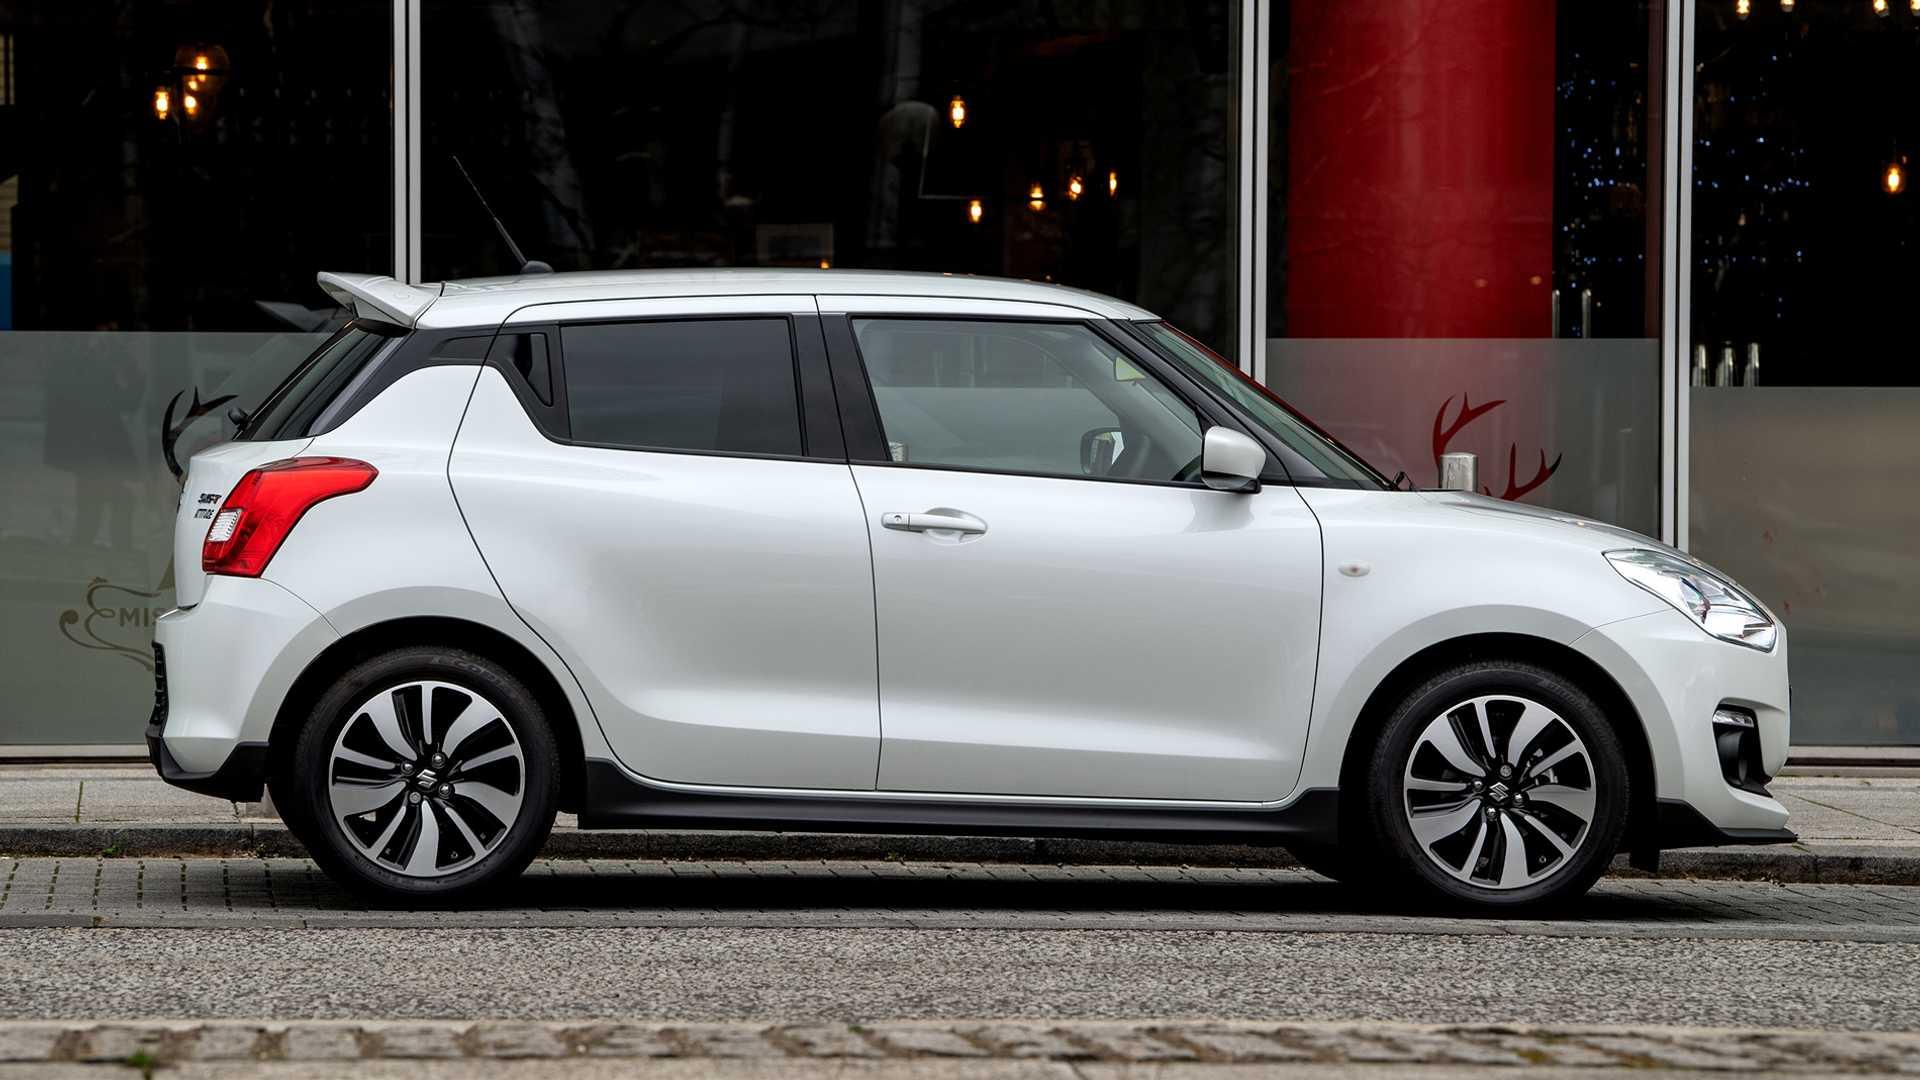 2019 Suzuki Swift Gains Attitude In the UK - autoevolution